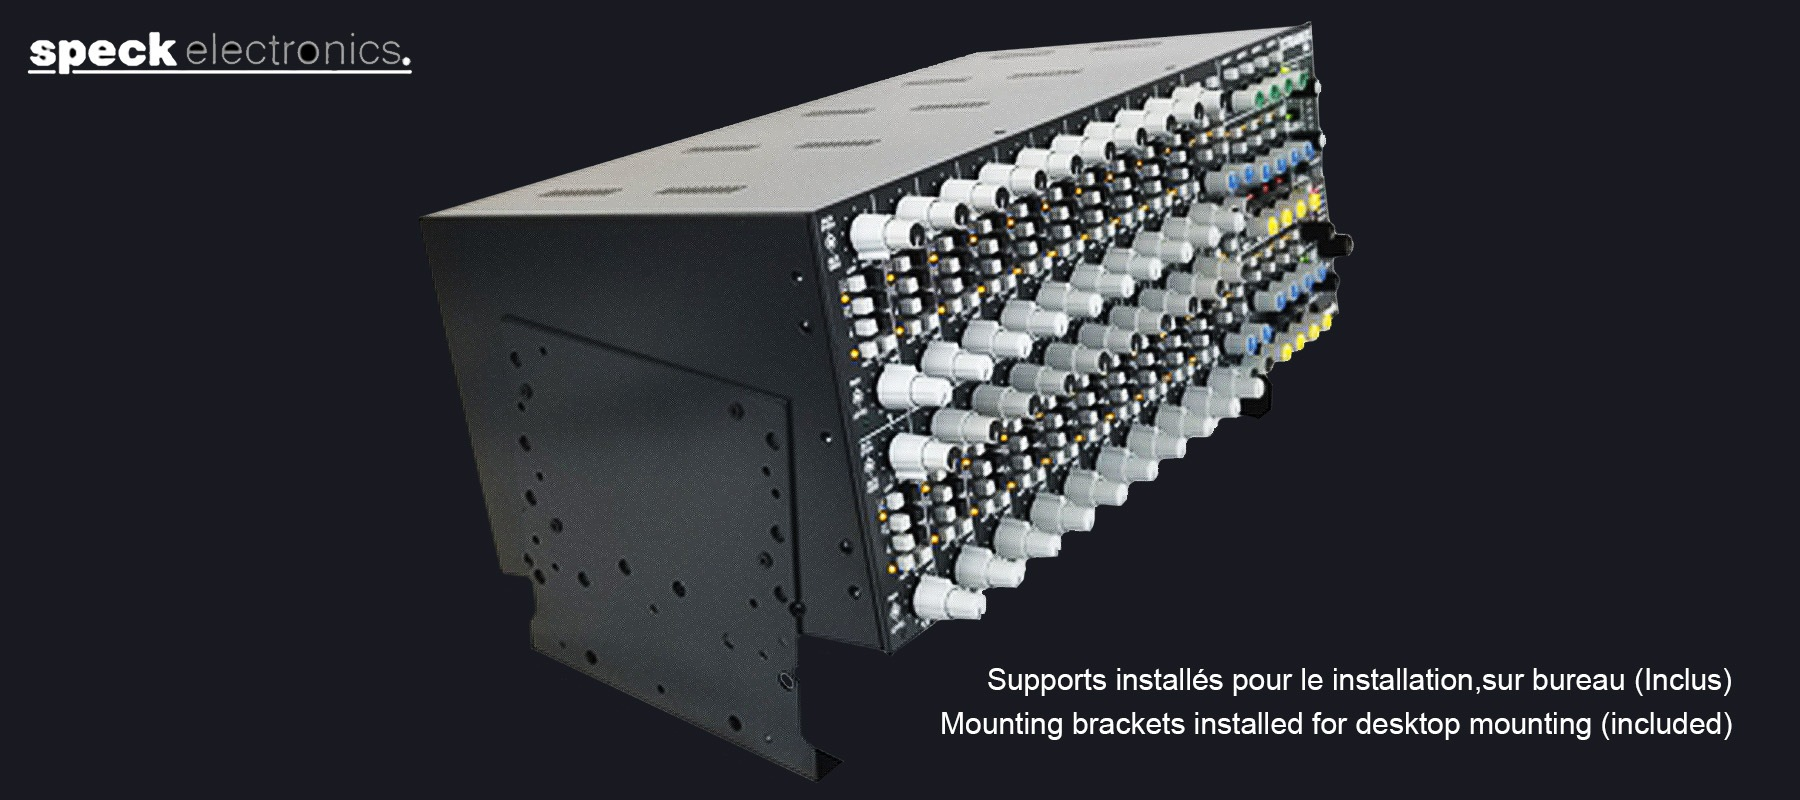 Speck Electronics Xtramix X6 - Side